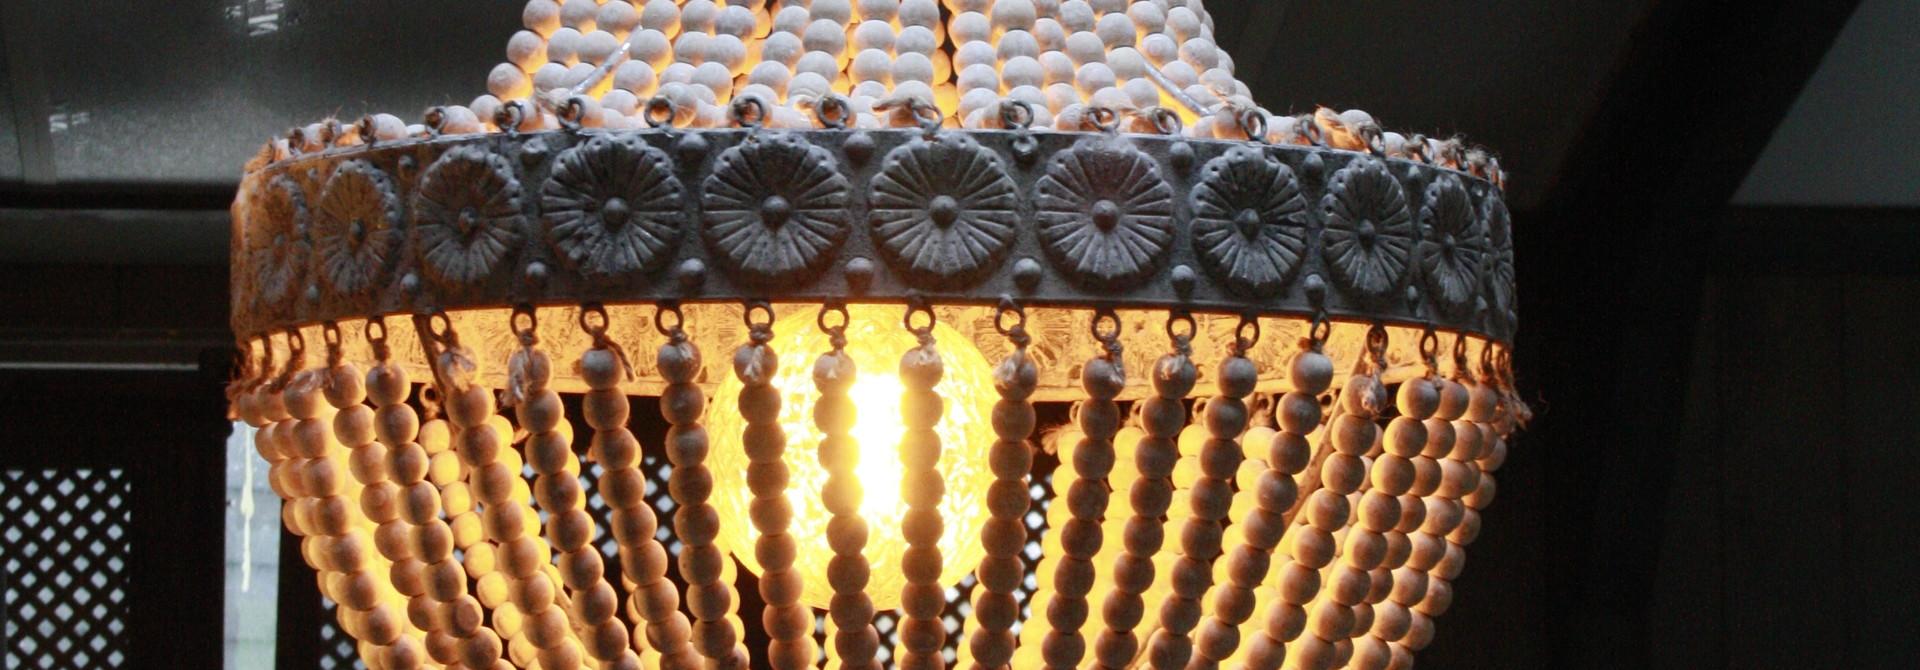 Kralen Hanglamp Wit XL Rosalie 62 x 51 cm